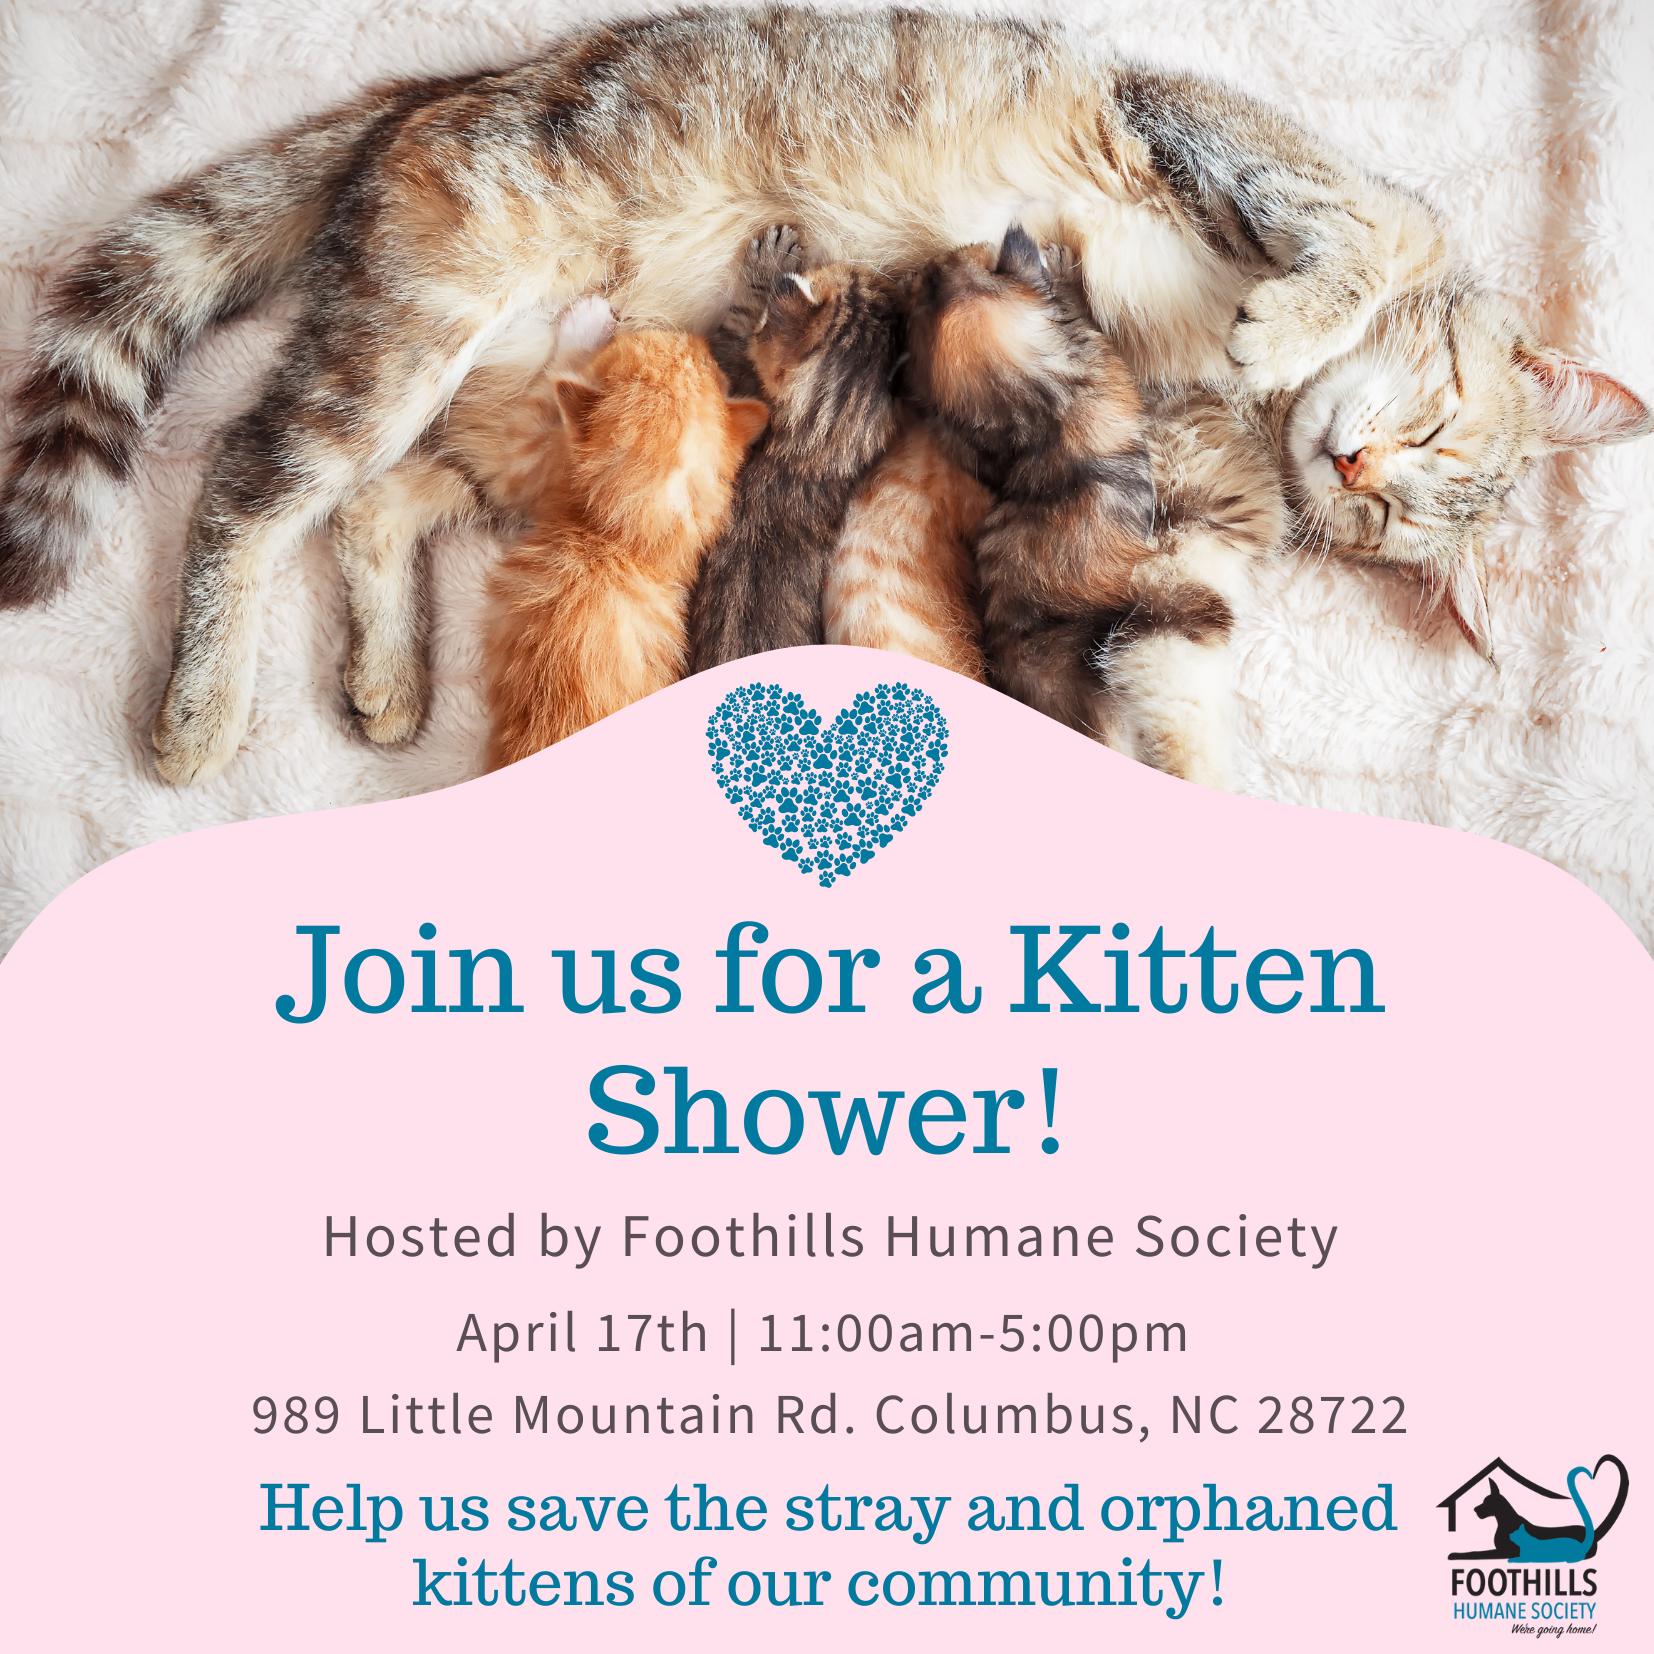 Foothills Humane Society Hosts Kitten Shower